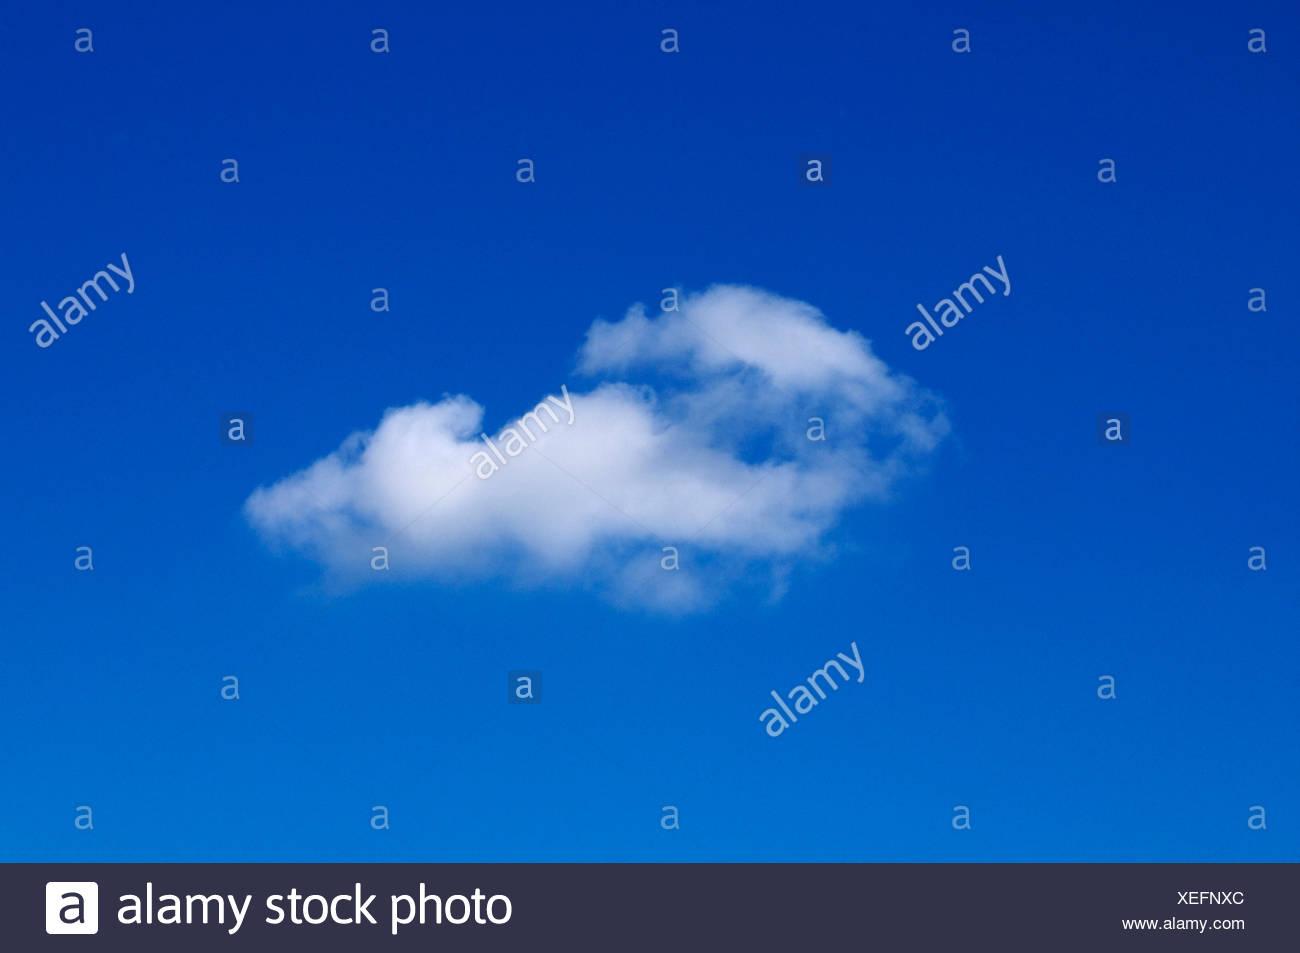 Cirrostratus nuage sur ciel bleu Photo Stock